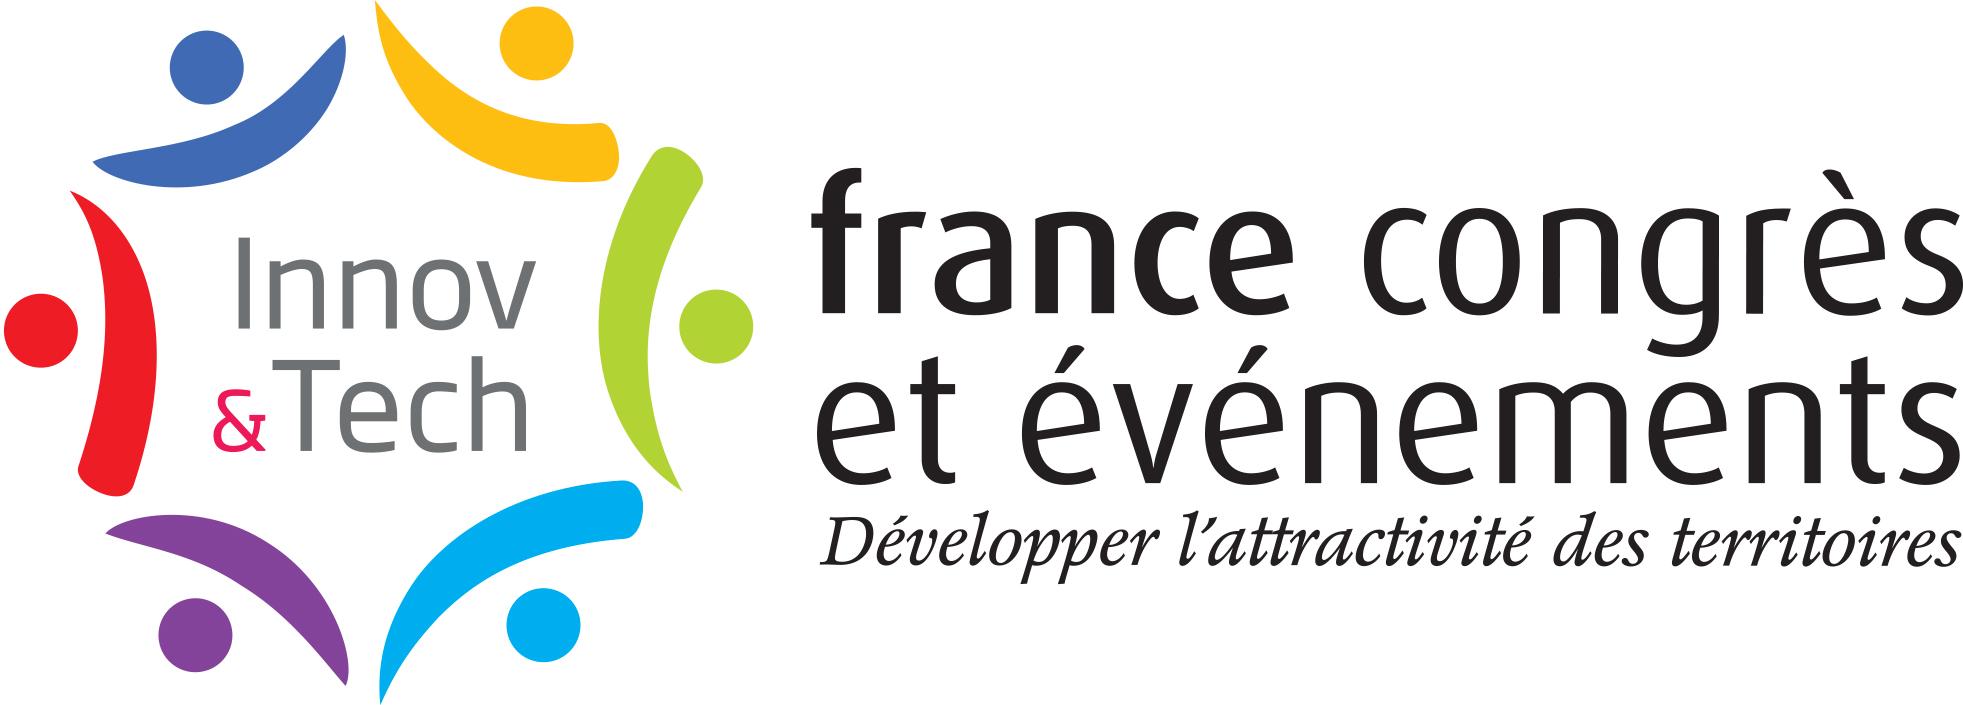 Francecongresnouveaulogo2017cmjnhorizontalinnov1488966459148896645914903726251490372625